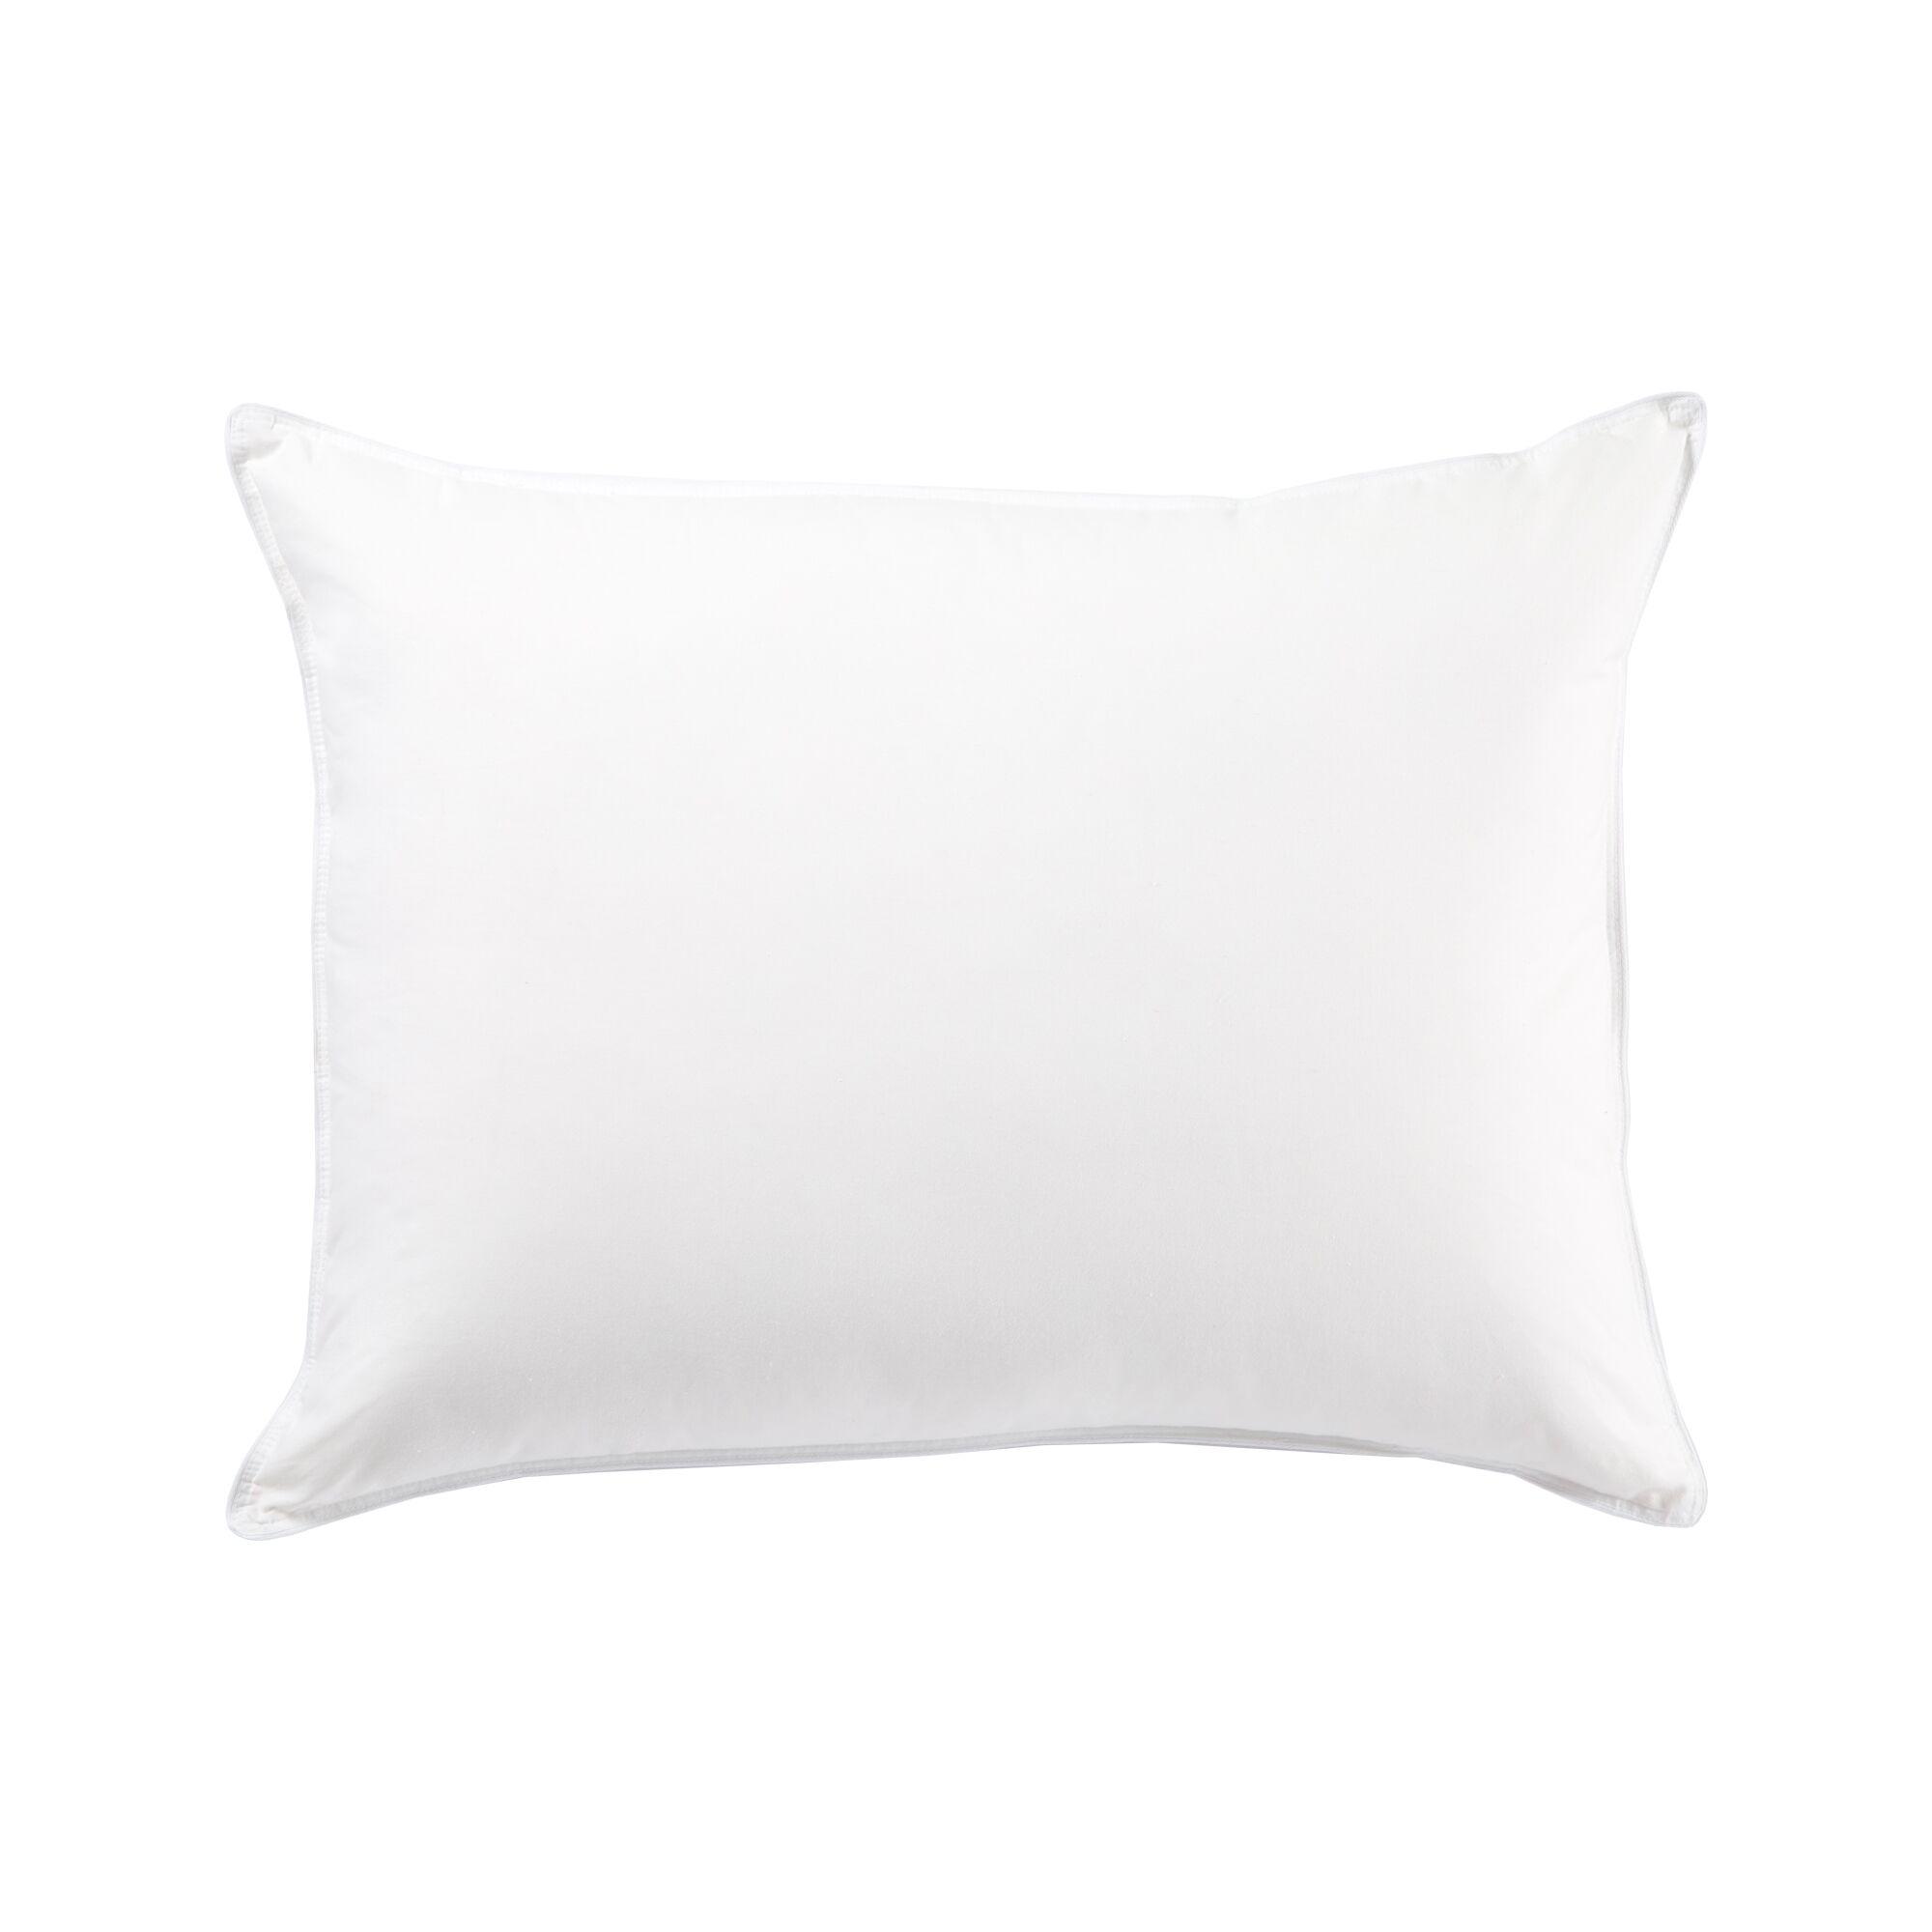 Soft Down Pillow Size: King